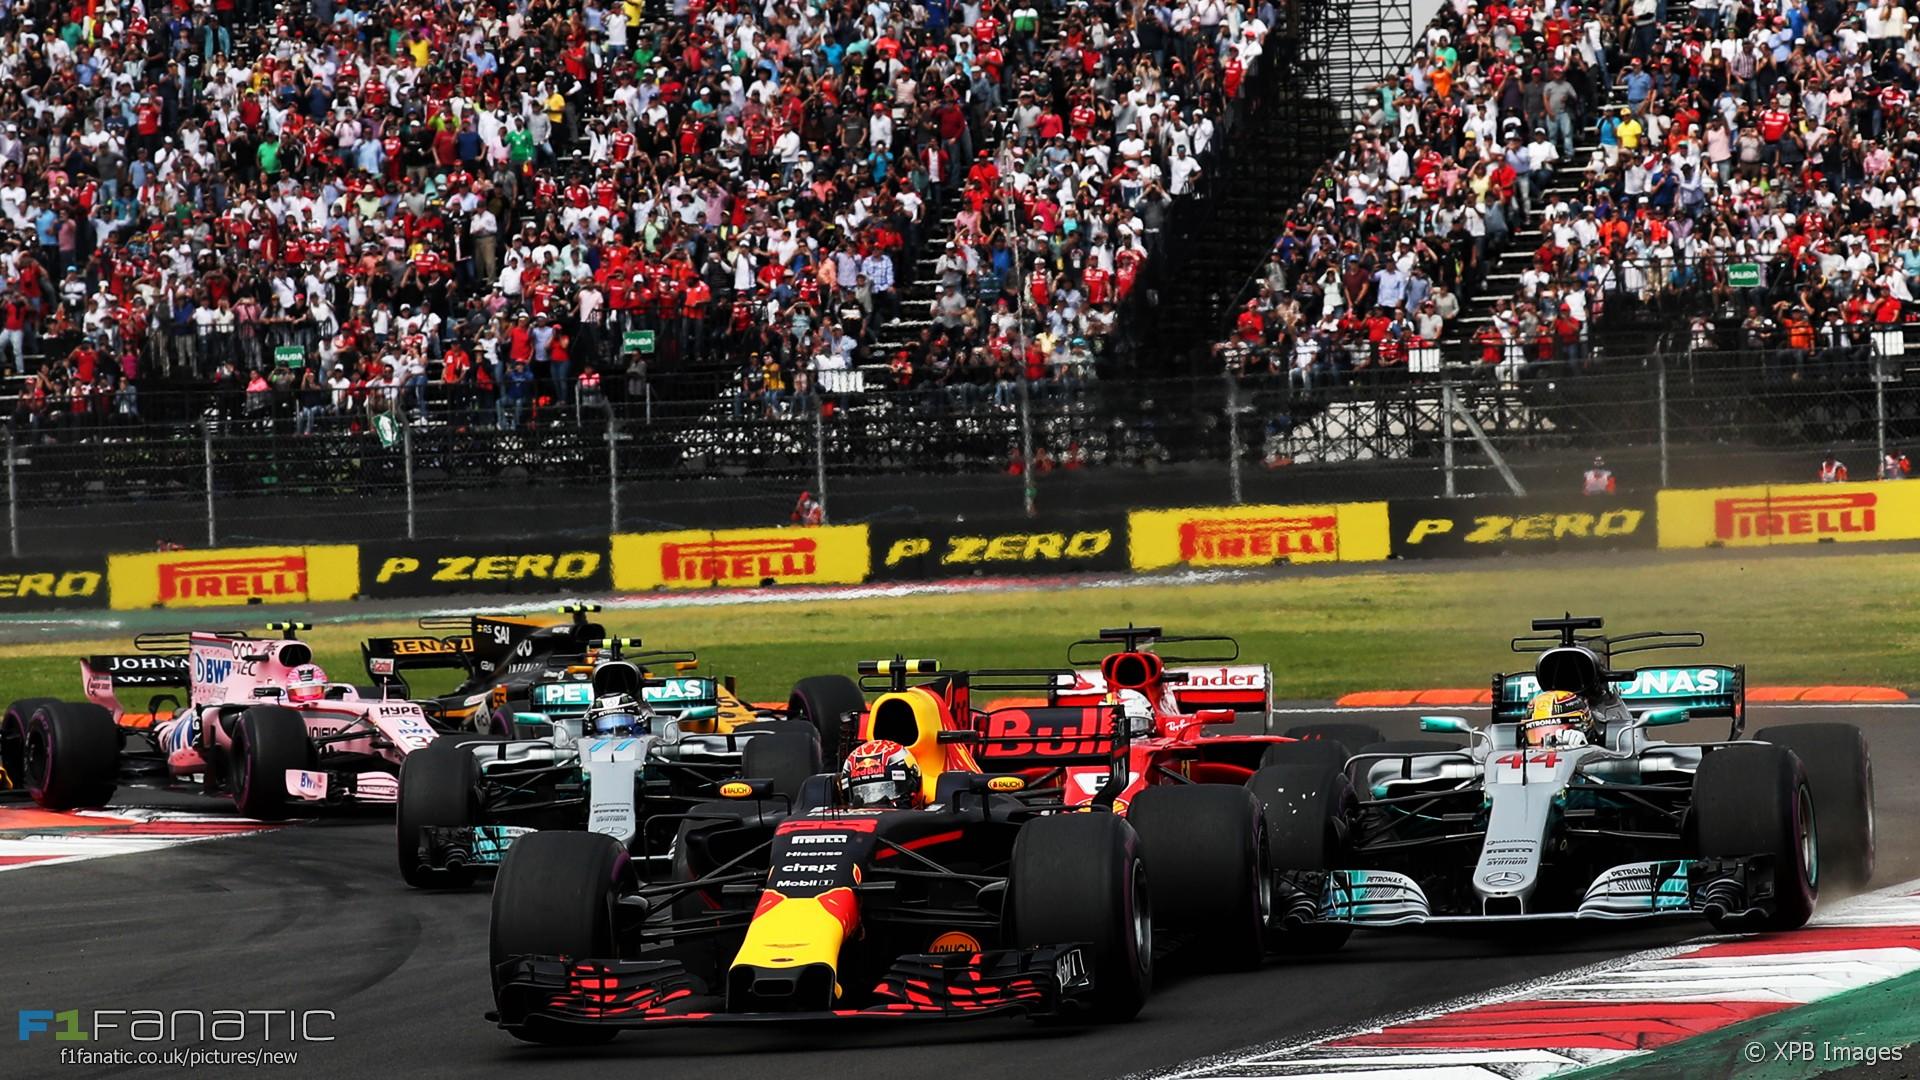 Max Verstappen, Lewis Hamilton, Sebastian Vettel, start, Autodromo Hermanos Rodriguez, 2017